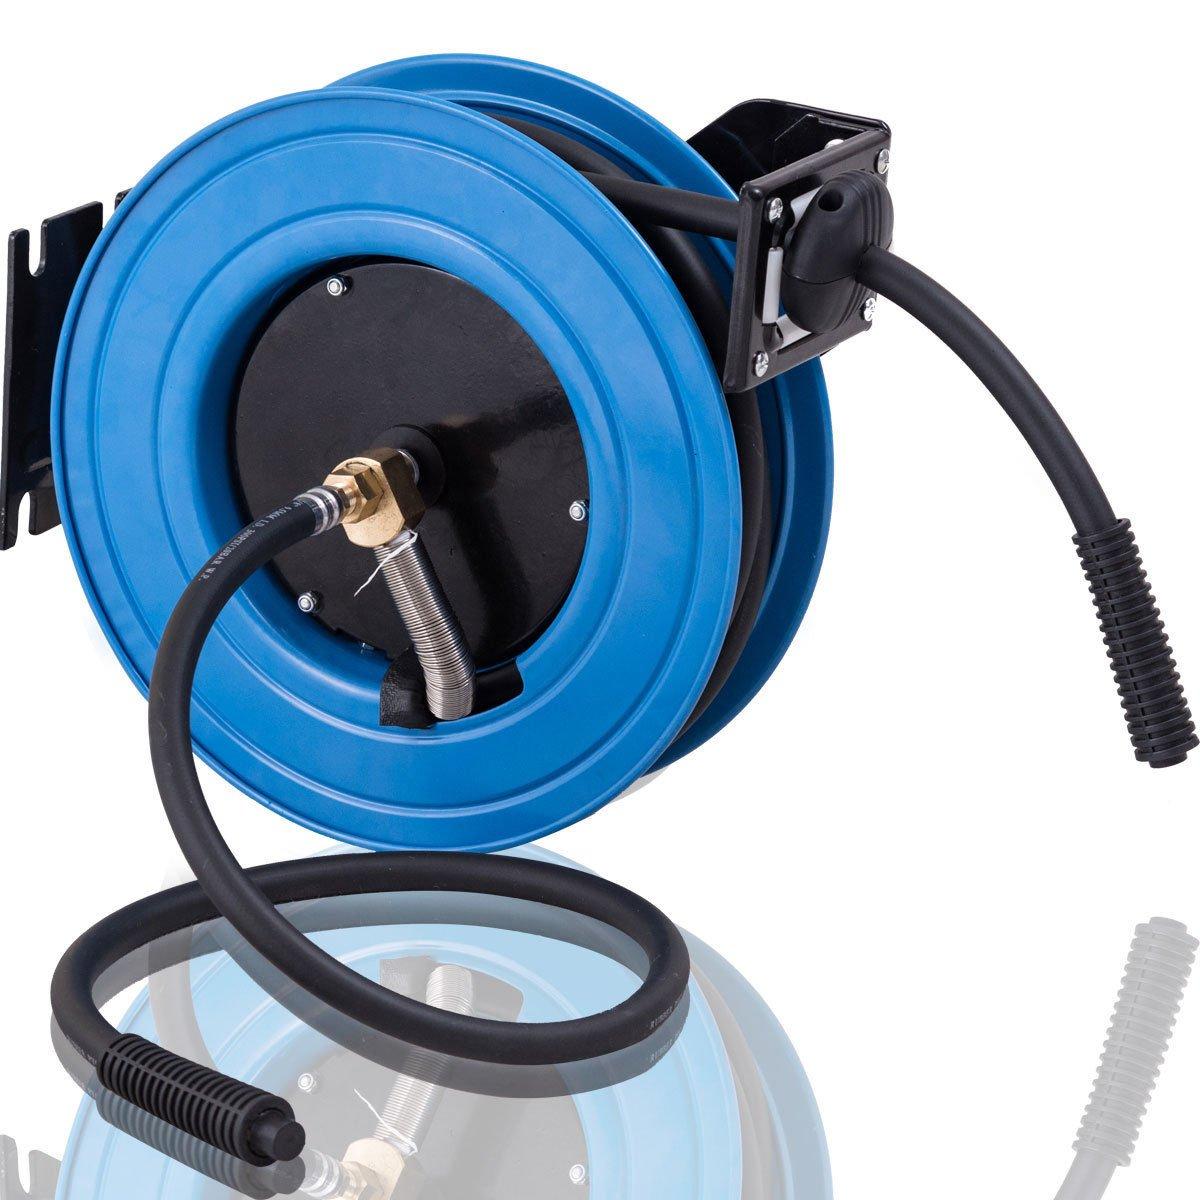 Goplus Retractable Auto Air Hose Reel Metal Construction w/ Lock Mechanism, 3/8 in, Hybrid Hose, 300PSI